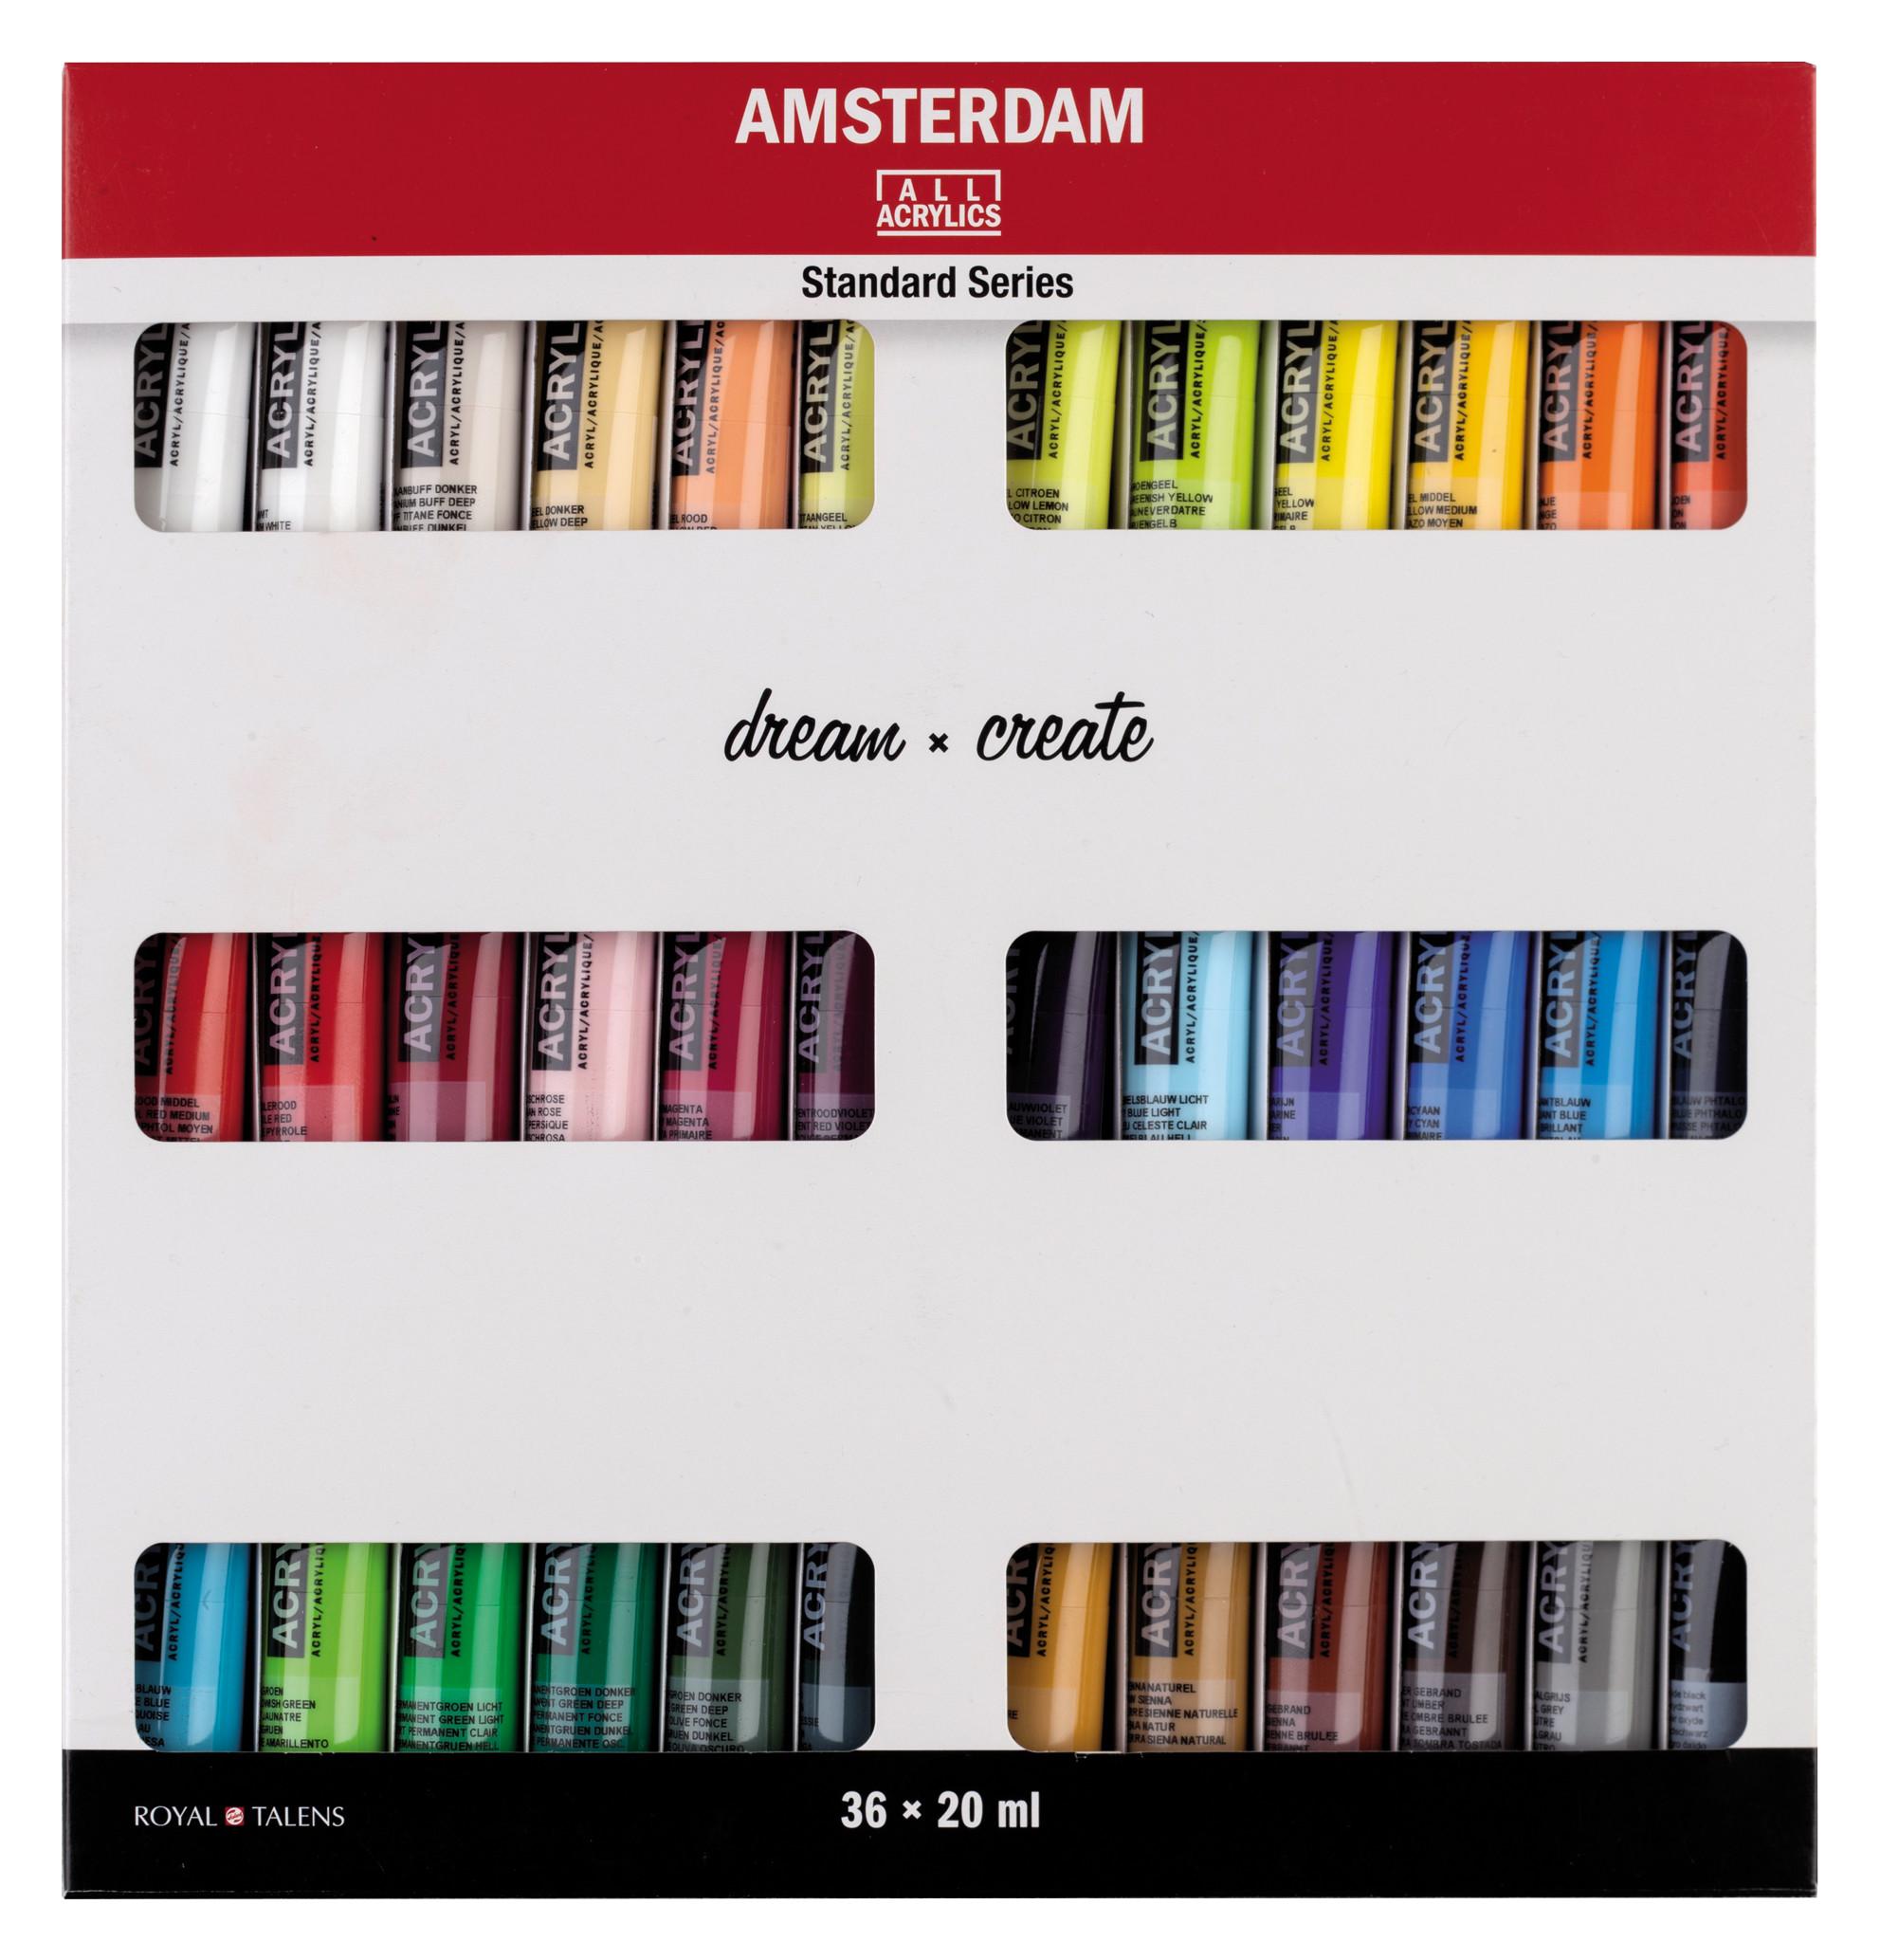 Amsterdam Standard Series Acrylics 36 x 20 ml Set